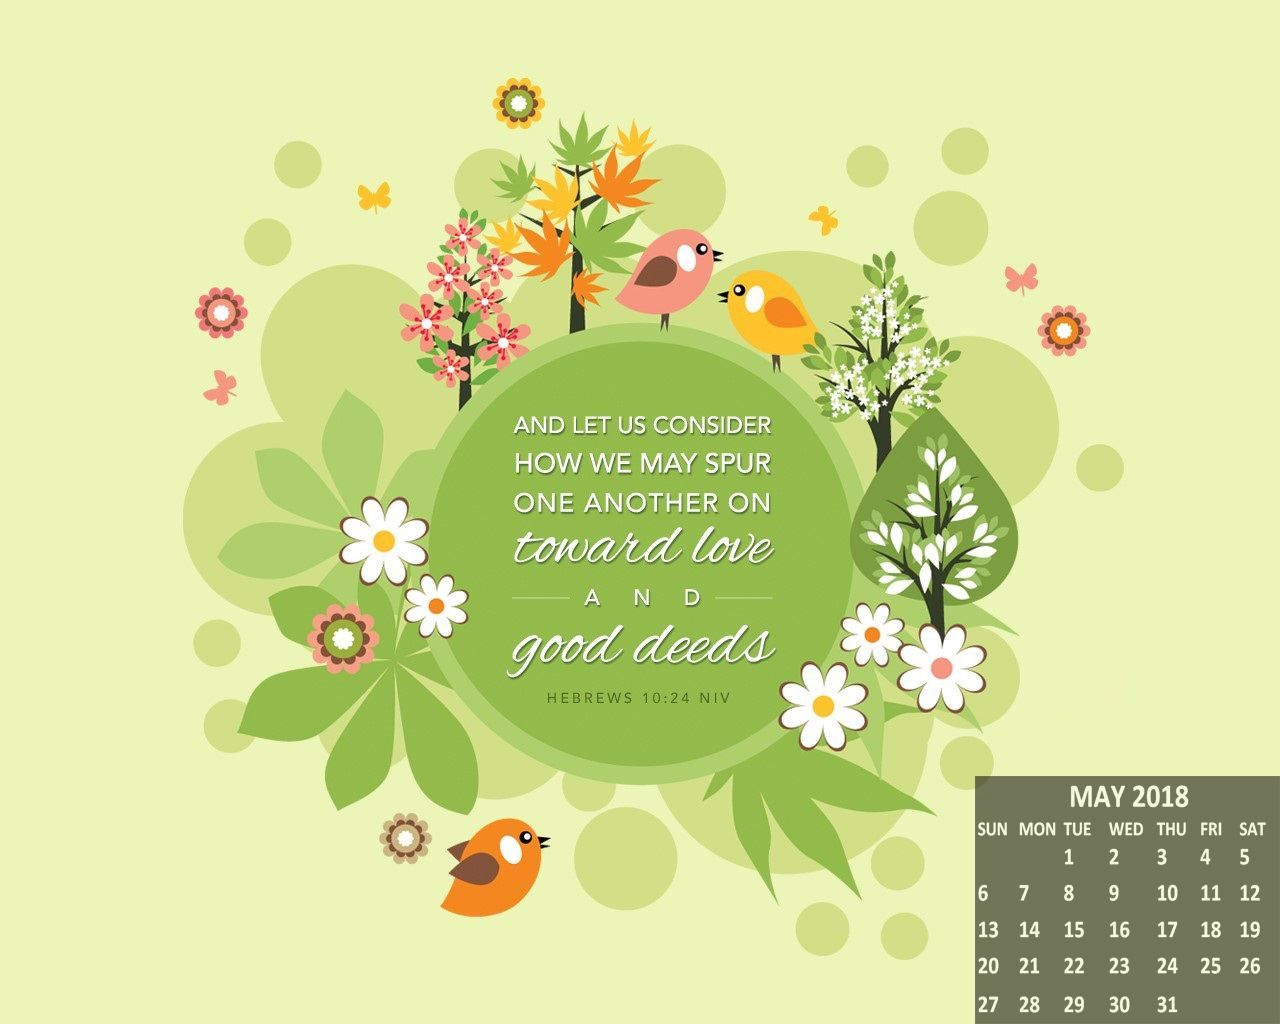 Free May 2018 Wallpaper Calendar